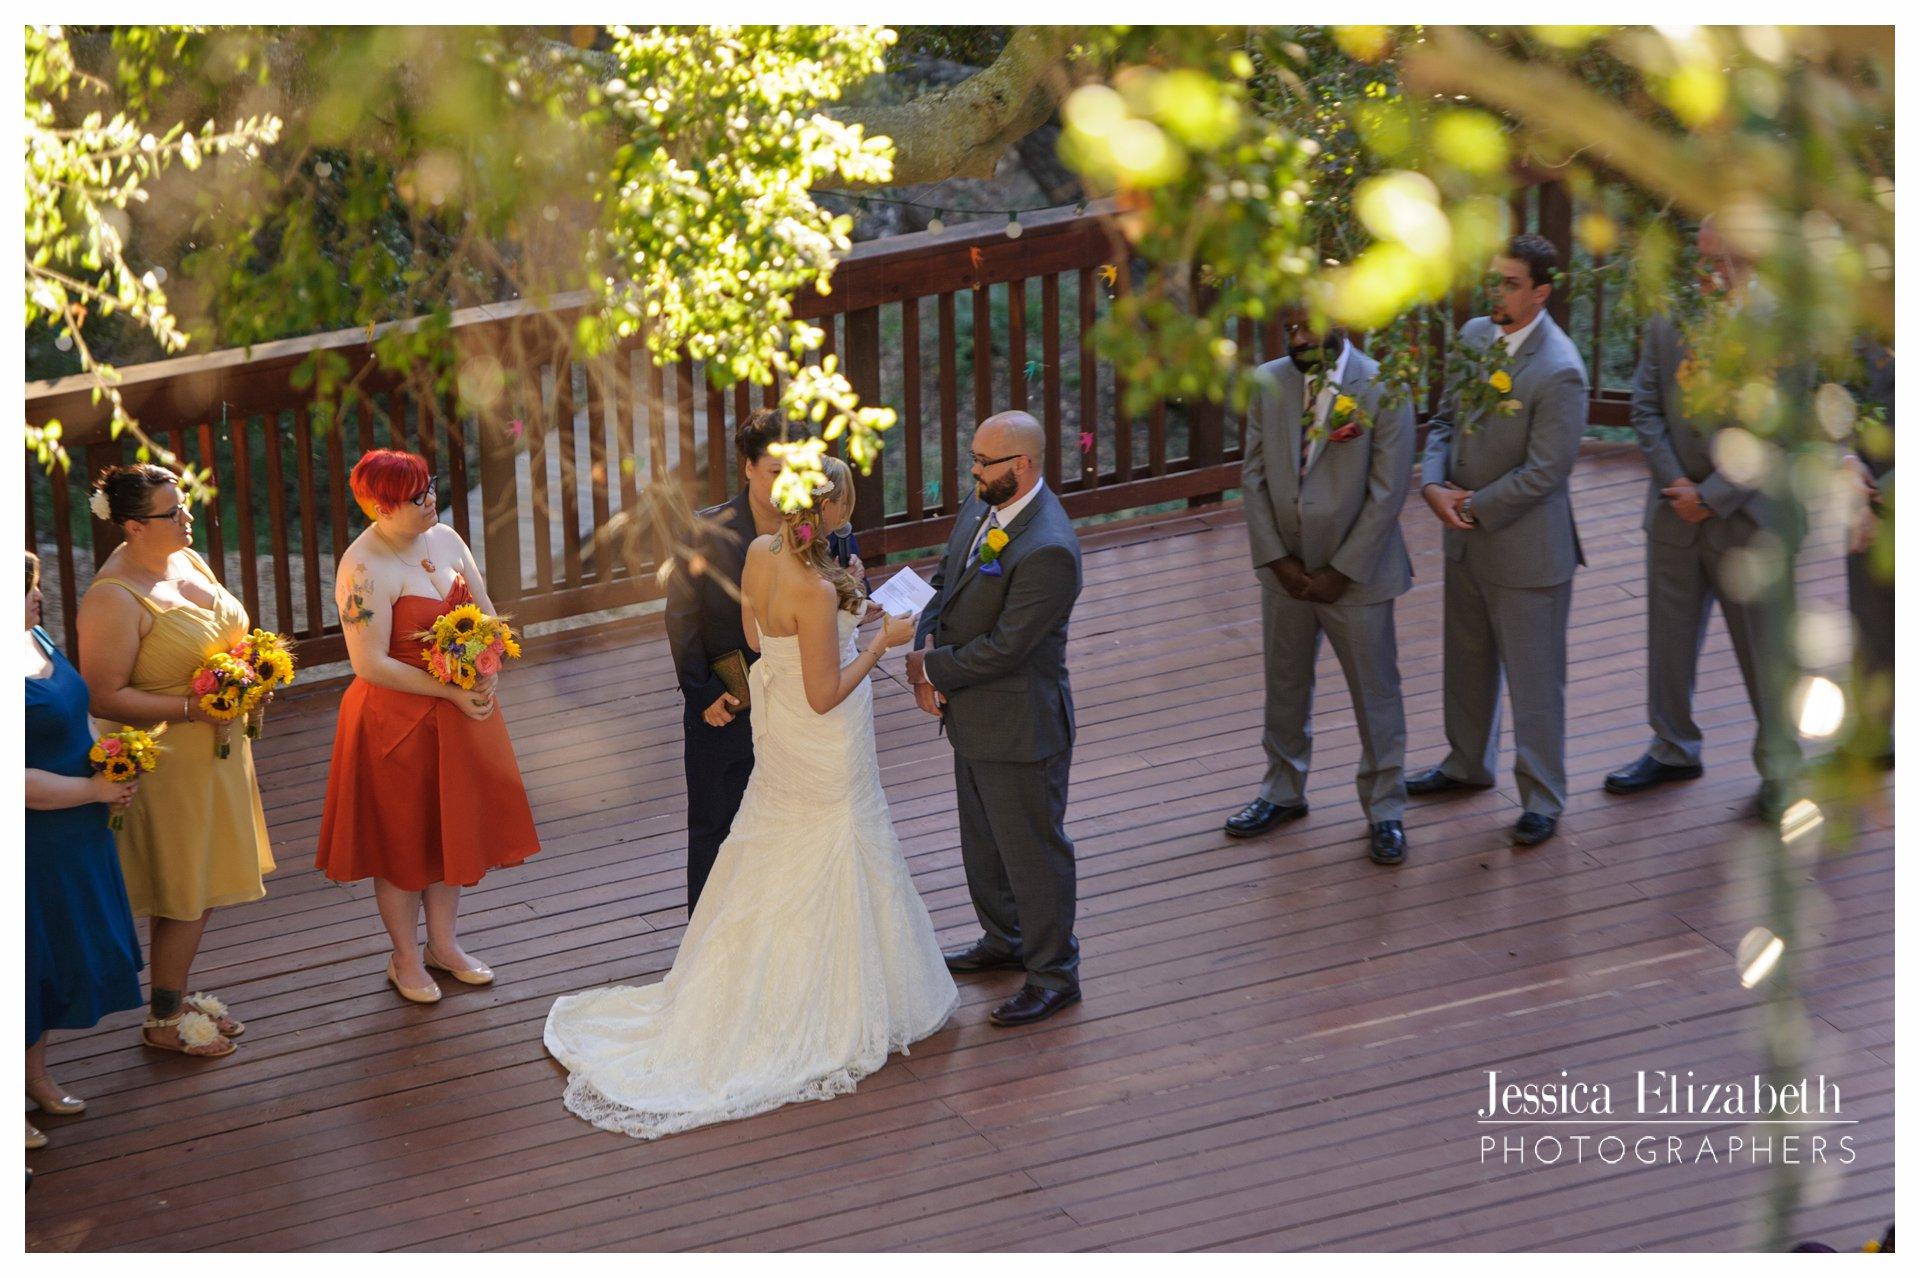 26-The-1909-Malibu-Wedding-photography-by-Jessica-Elizabeth-w.jpg